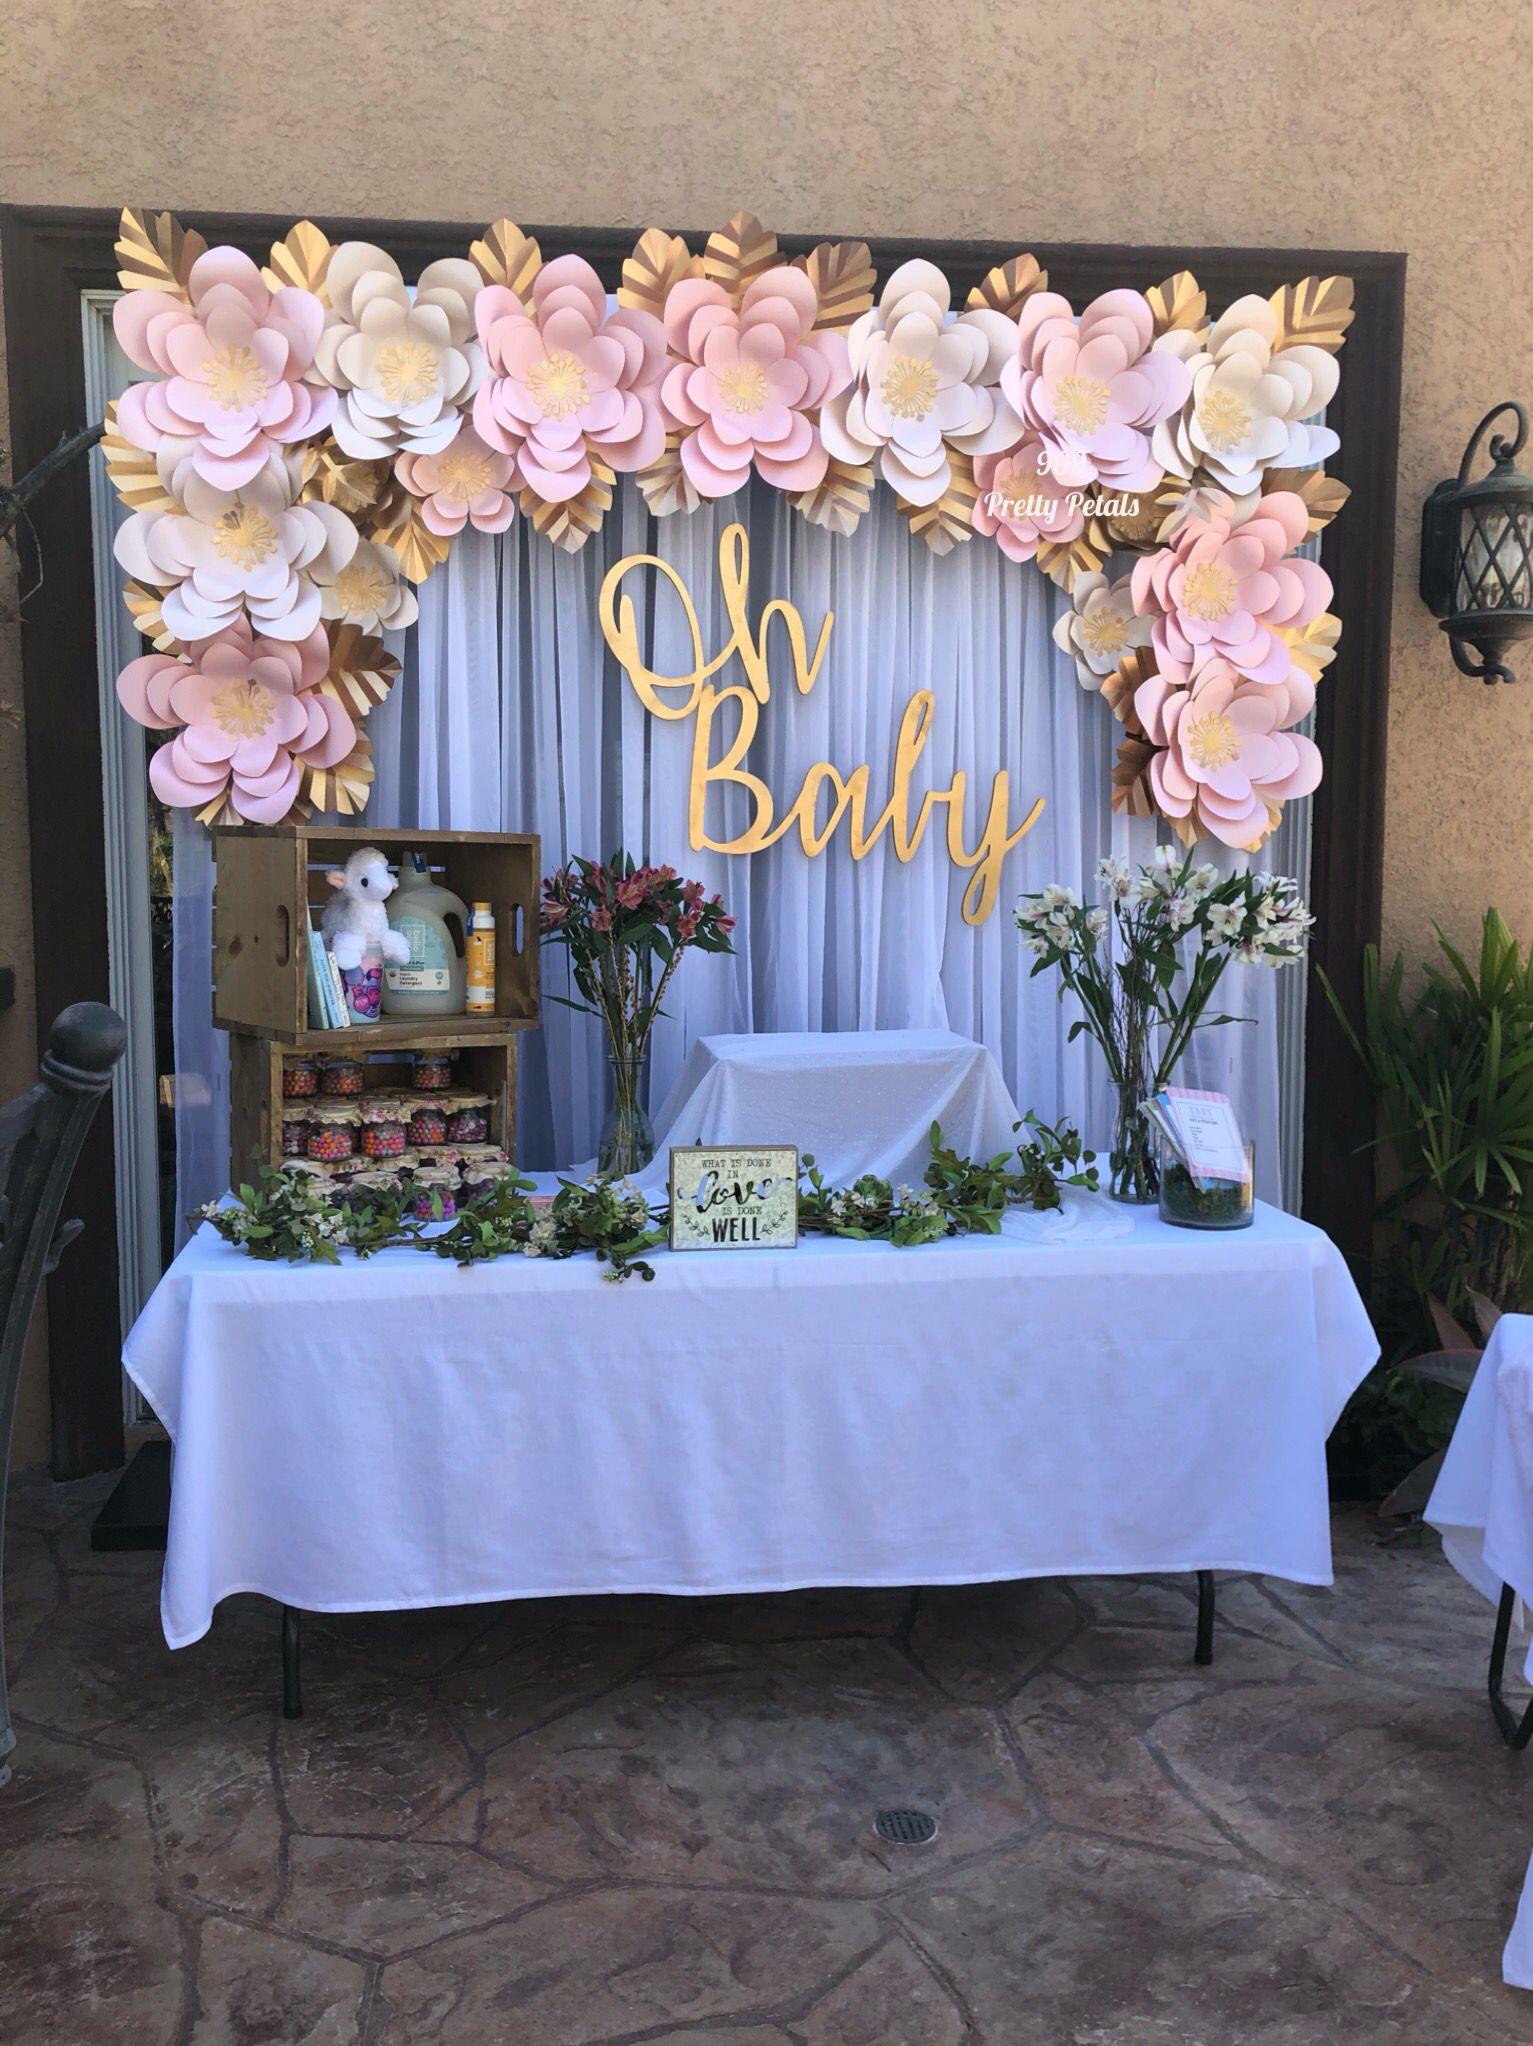 Baby Shower Backdrop : shower, backdrop, Paper, Flower, Backdrop, Shower, Theme,, Flowers,